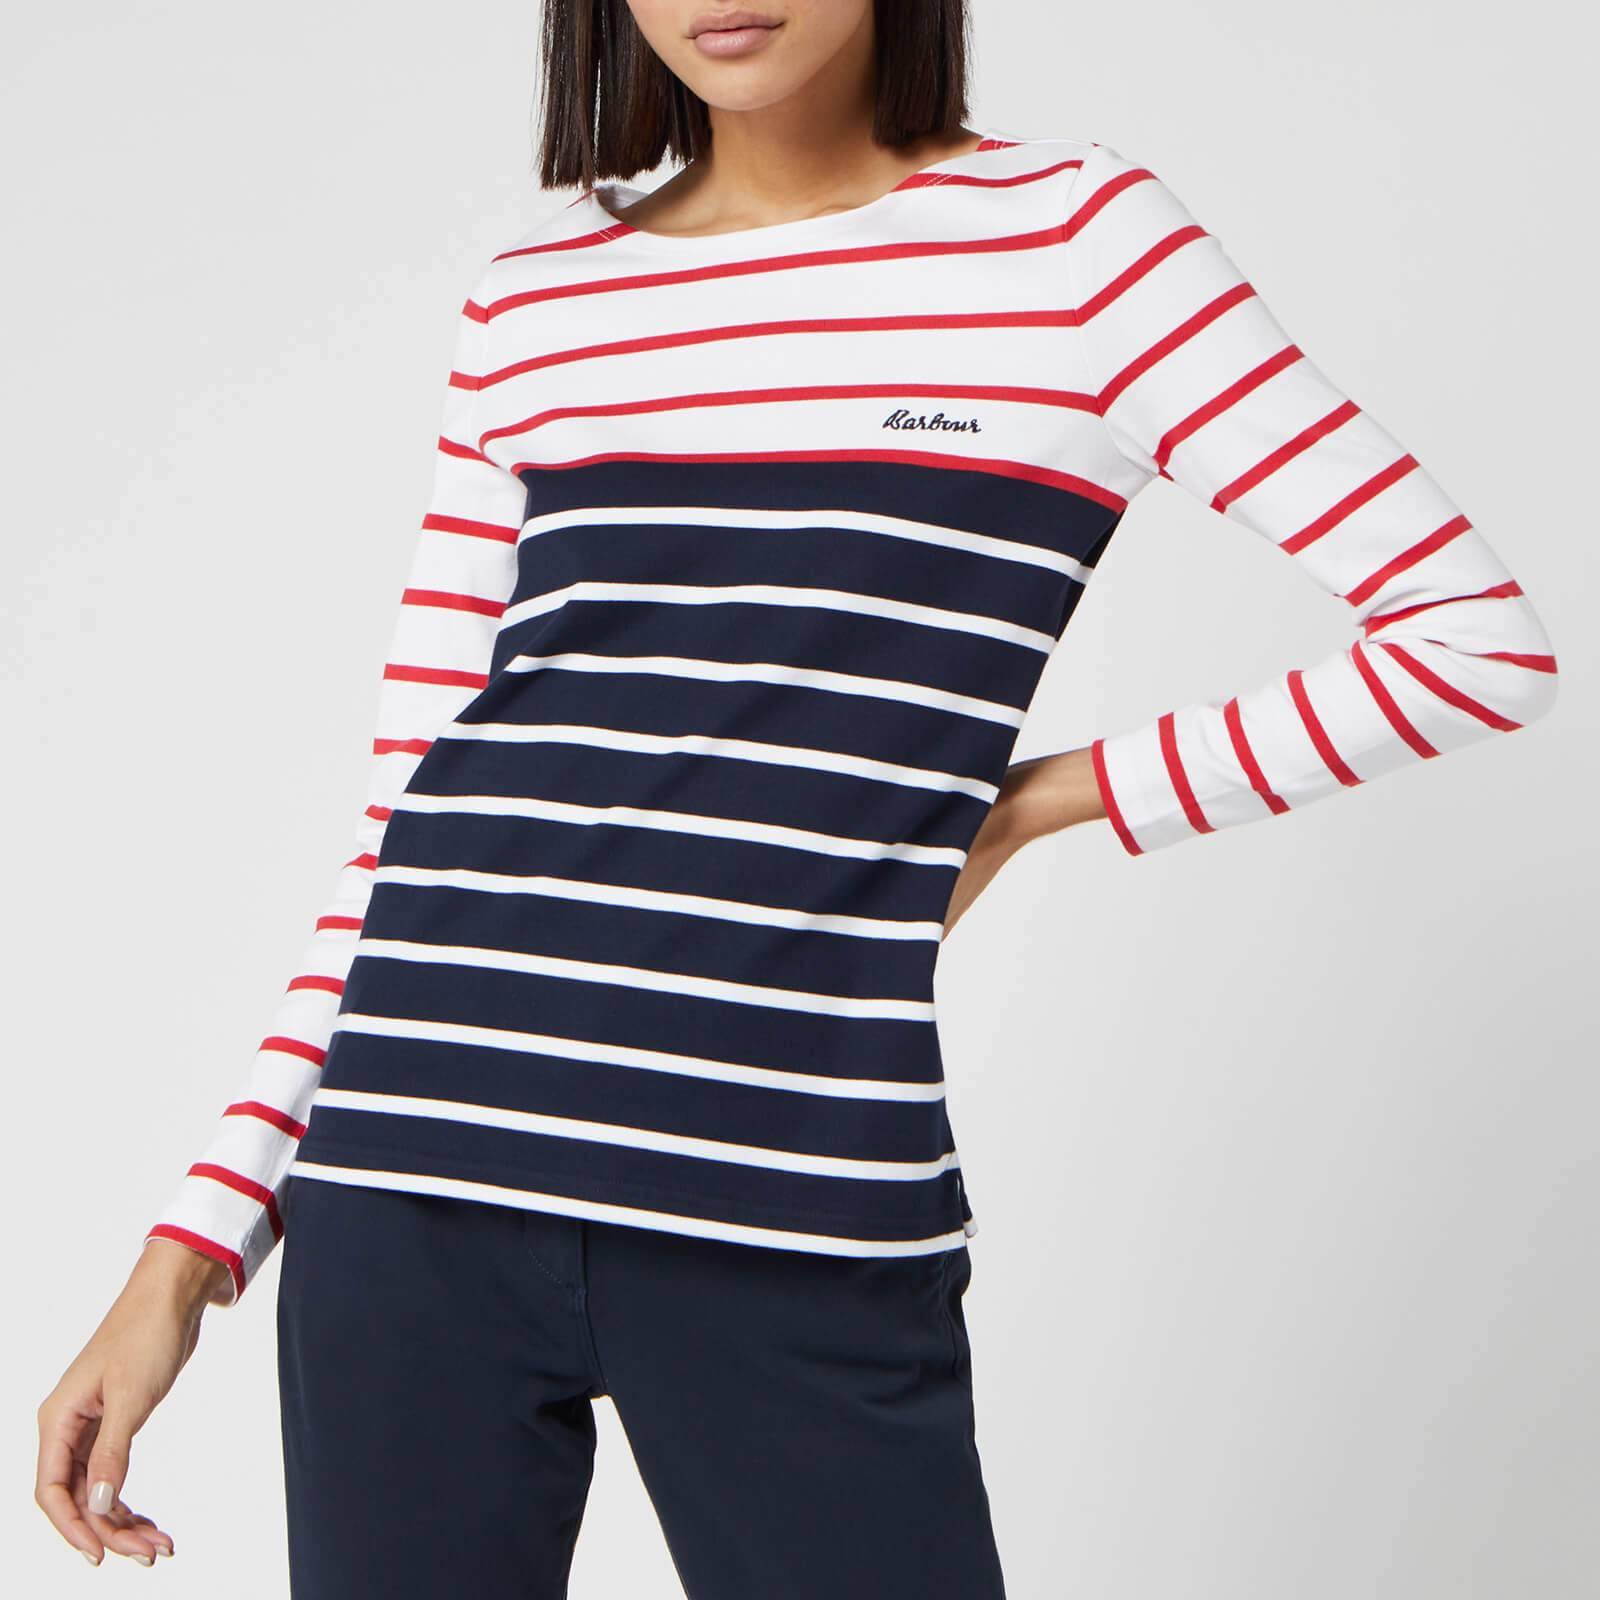 Barbour Women's Hawkins Breton Stripe Long Sleeve Top - White/Brick Red - UK 12